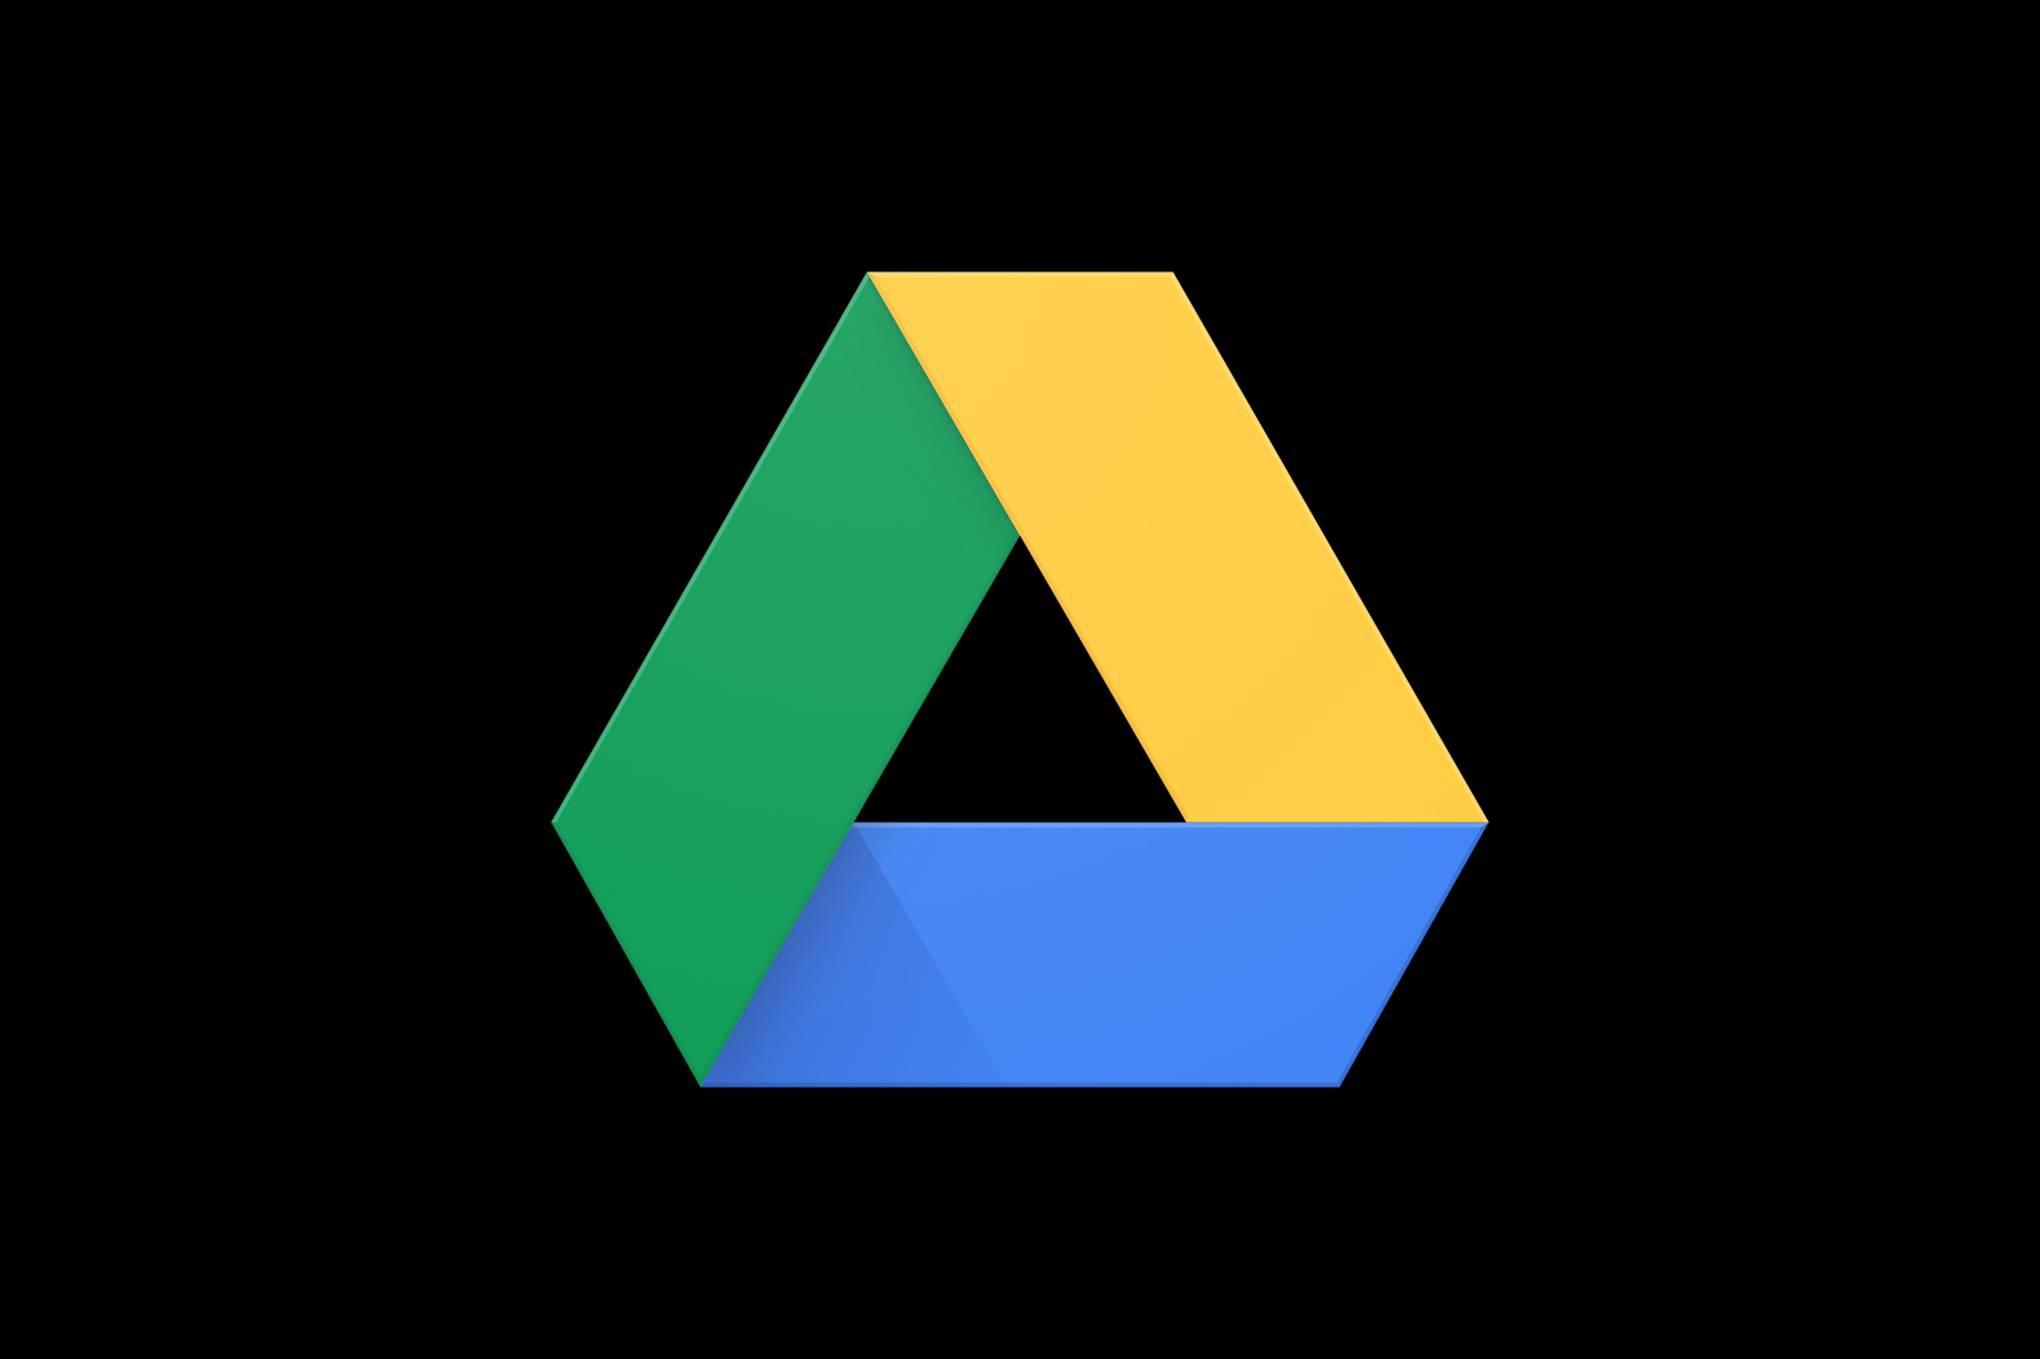 How to use Google Drive like a boss